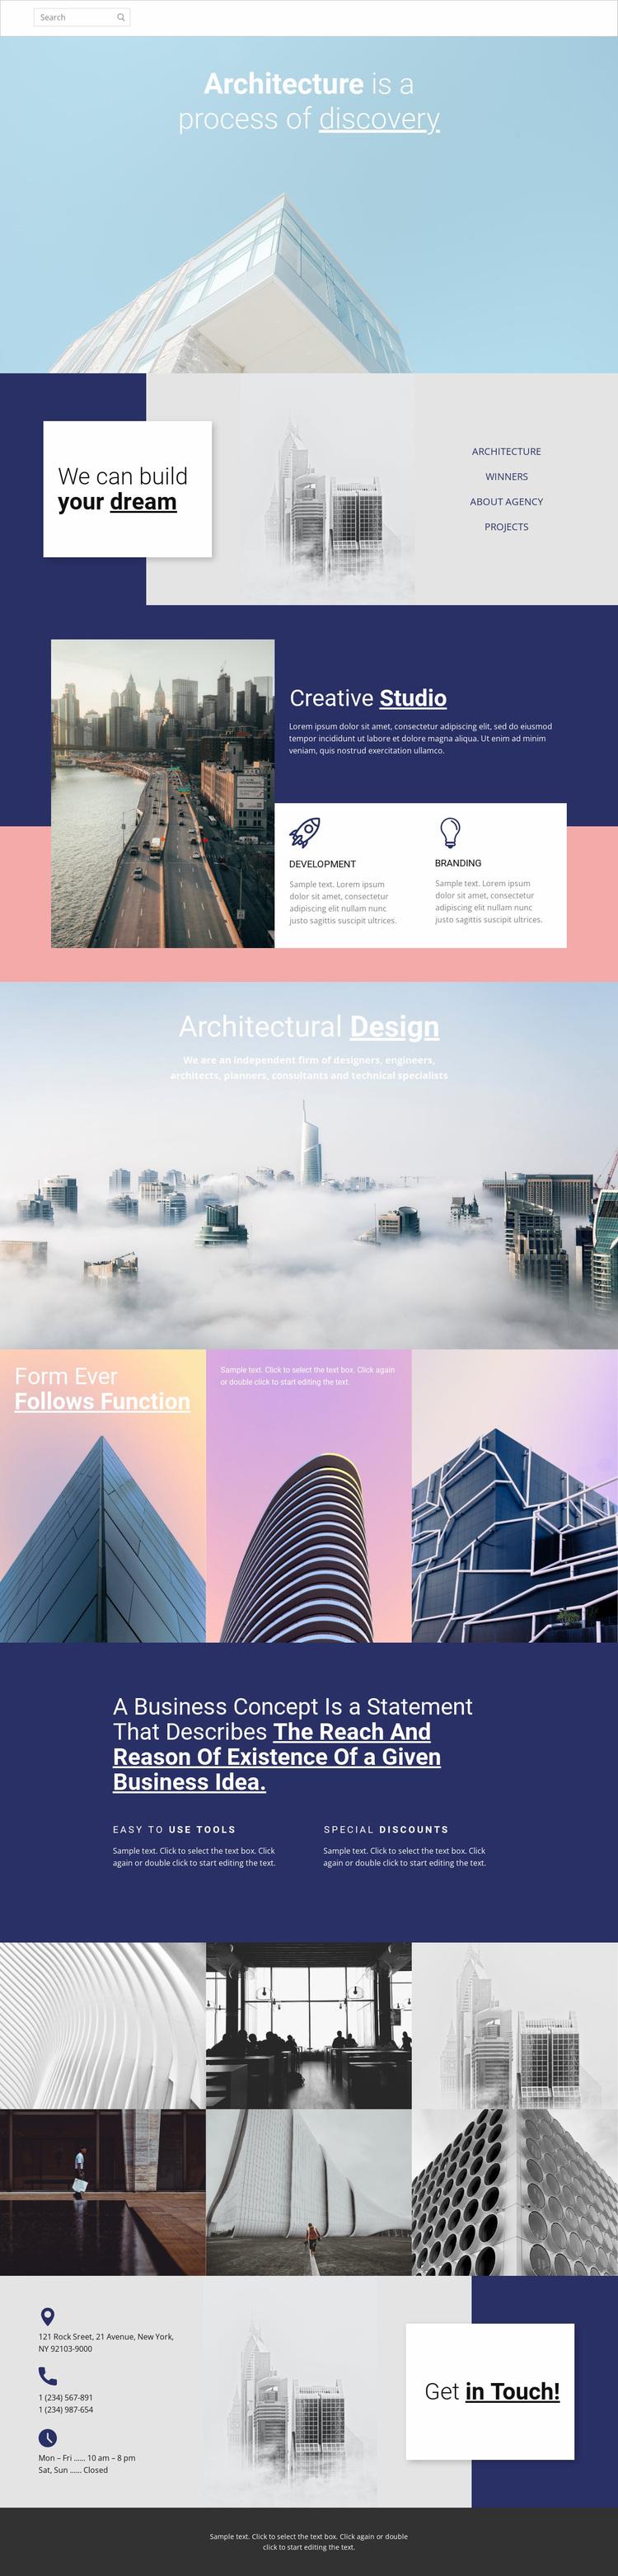 Wonders of architecture Website Design